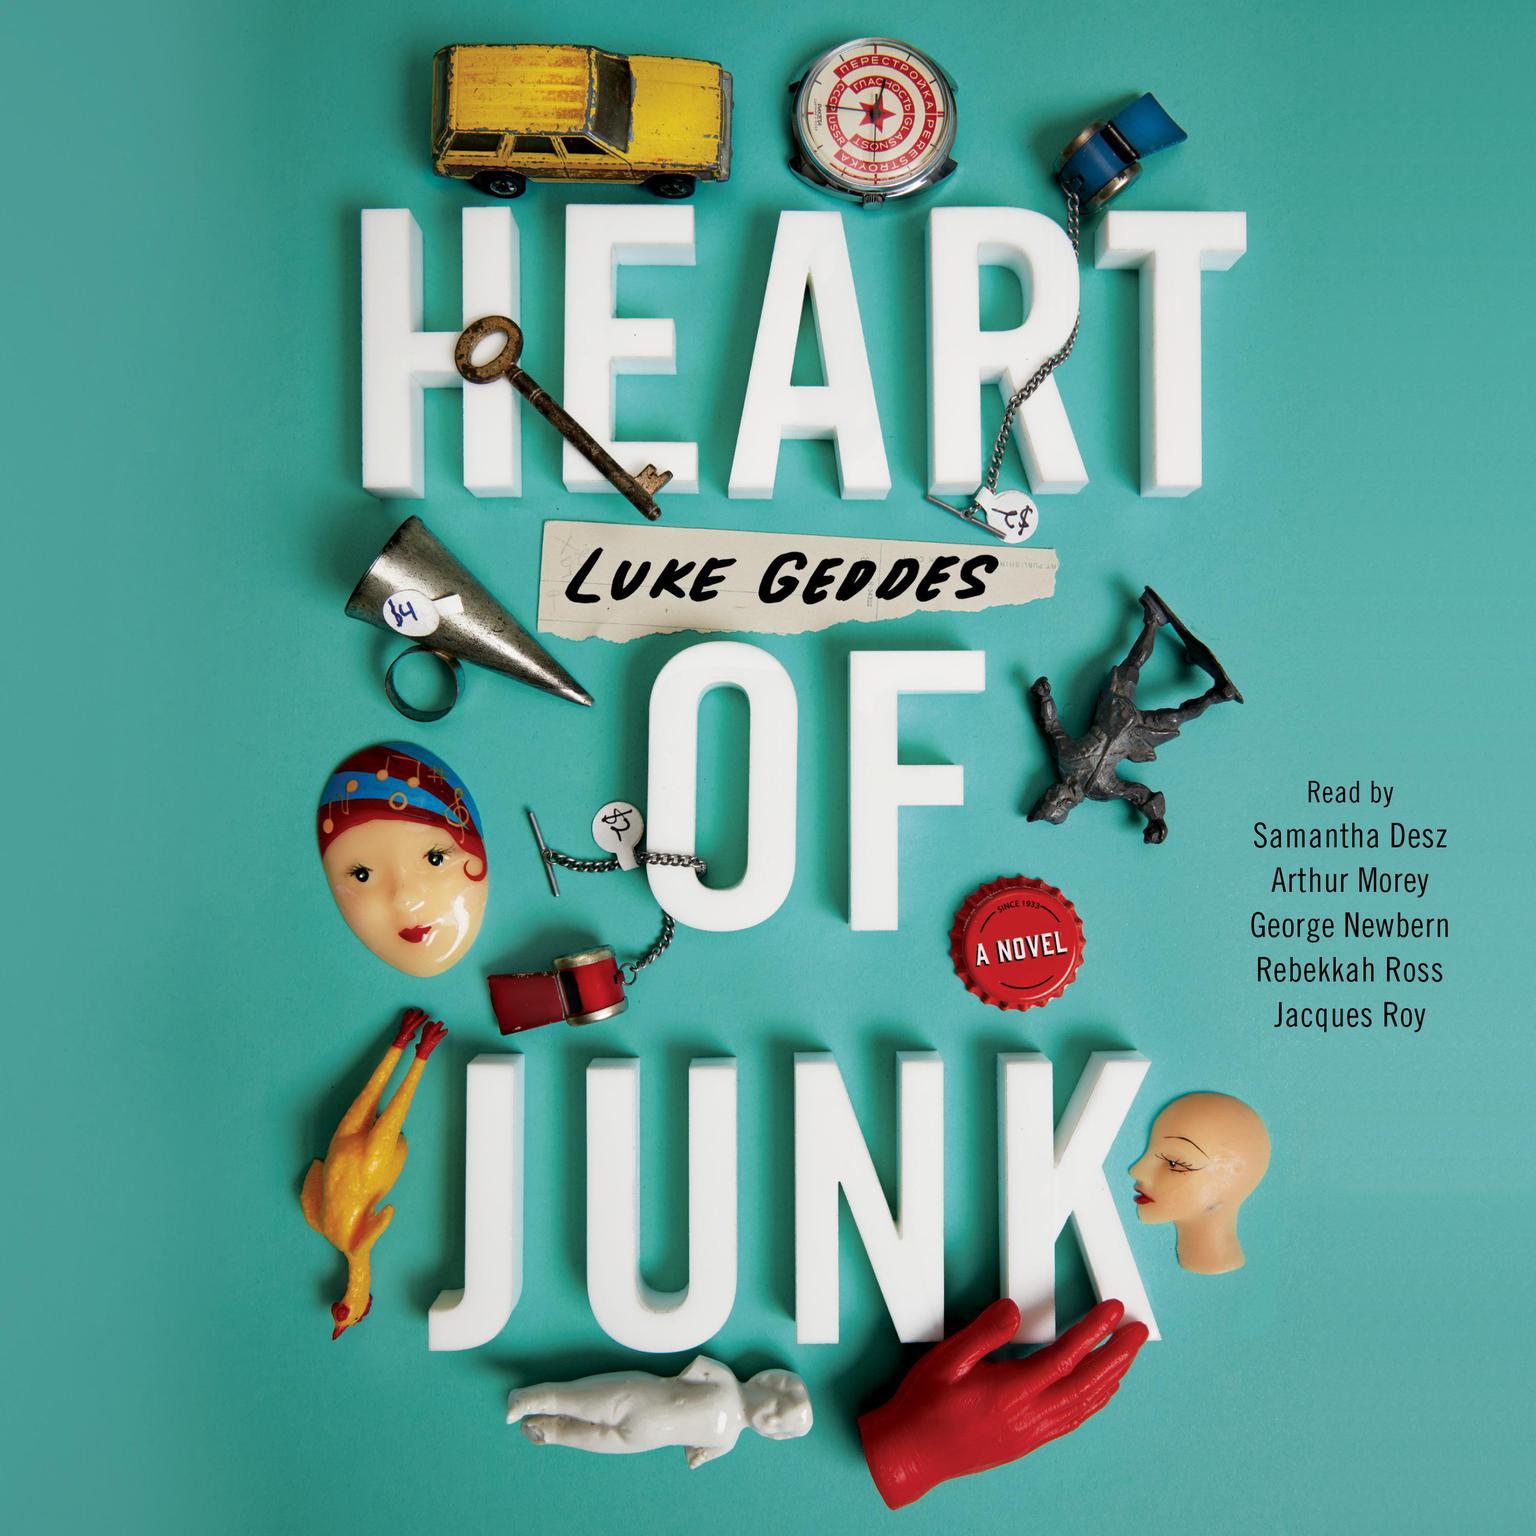 Heart of Junk Audiobook, by Luke Geddes